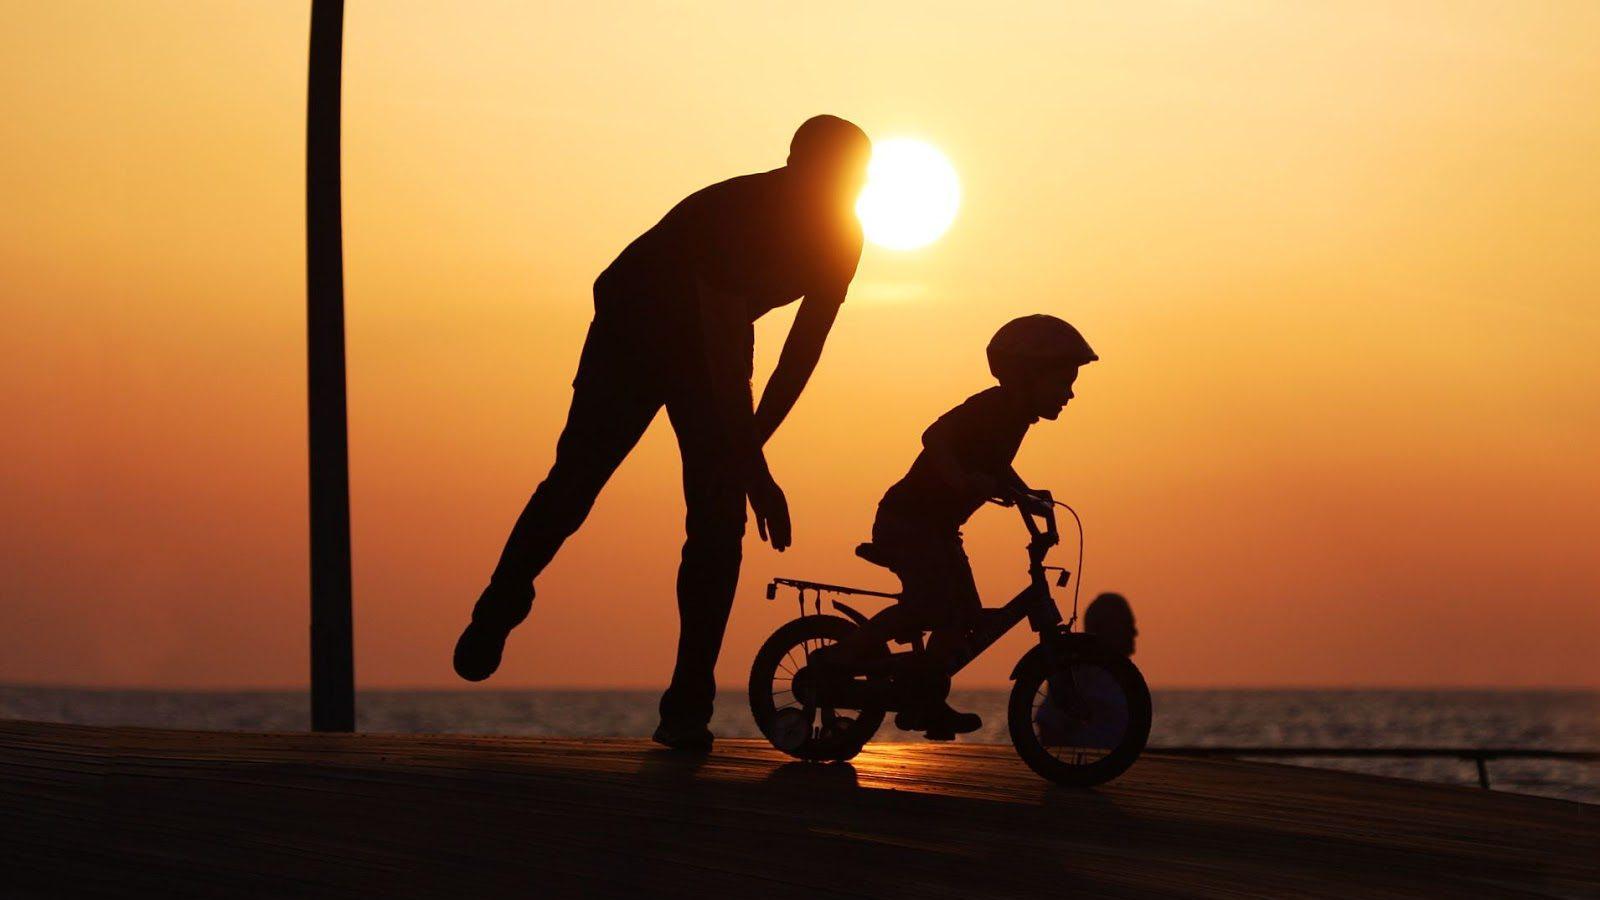 Fathers Day Backgrounds | PixelsTalk.Net